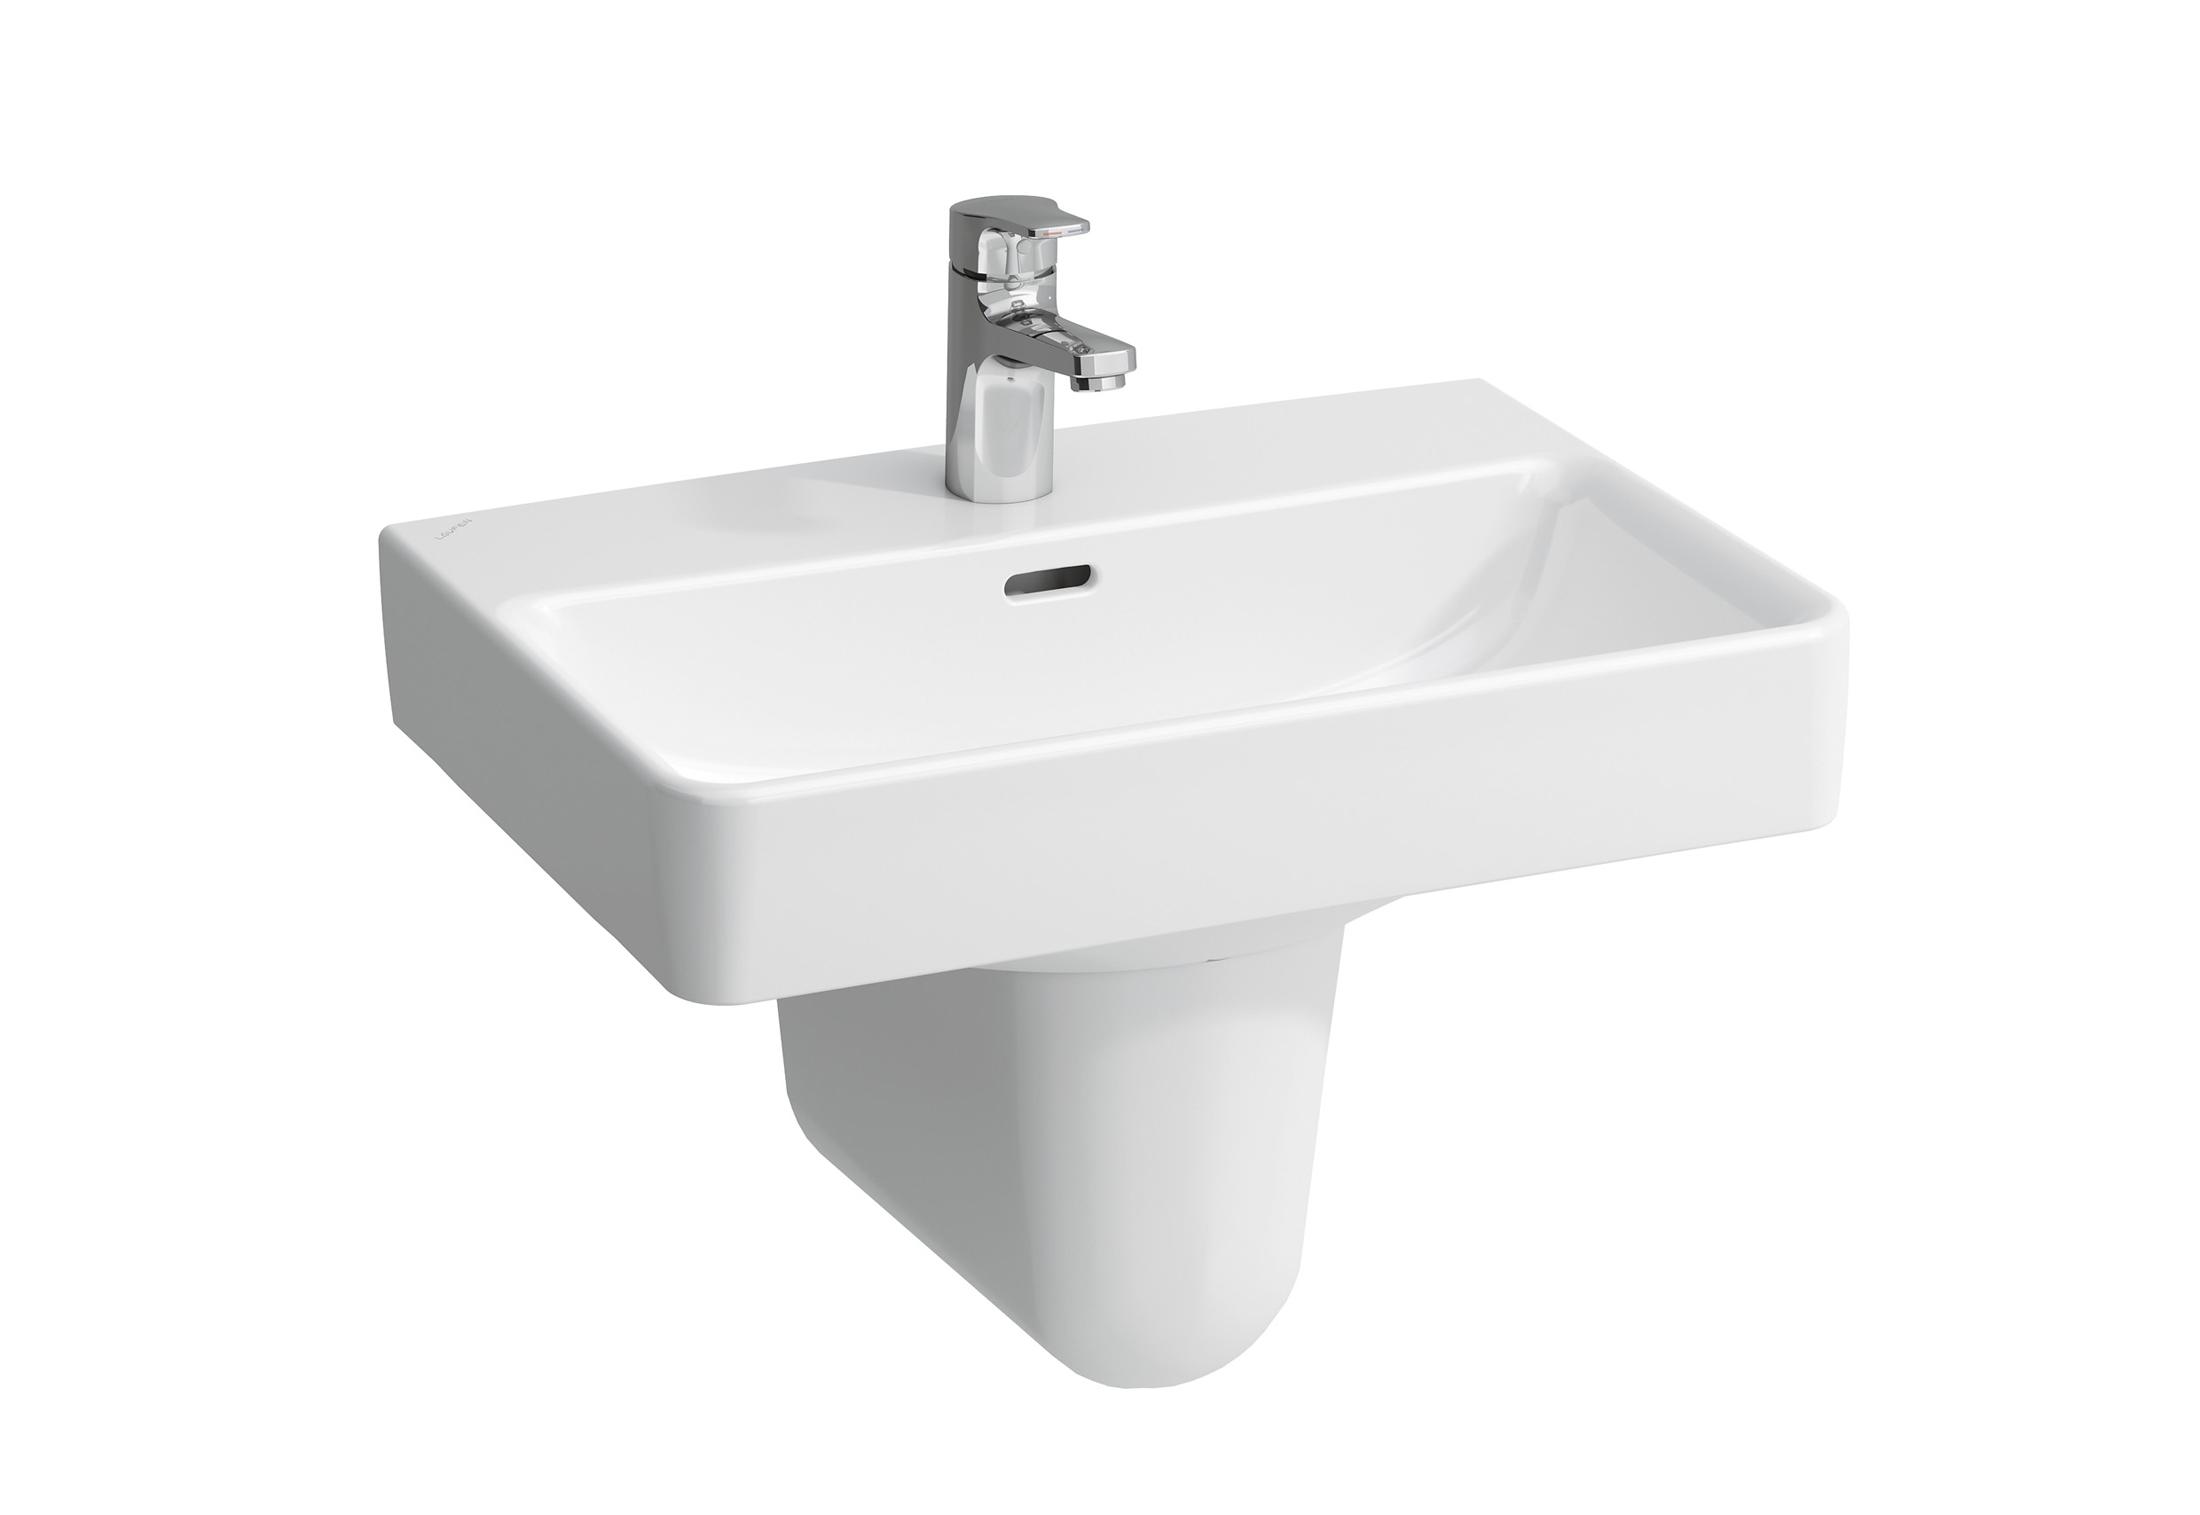 laufen pro washbasin s with semi pedestal by laufen stylepark. Black Bedroom Furniture Sets. Home Design Ideas